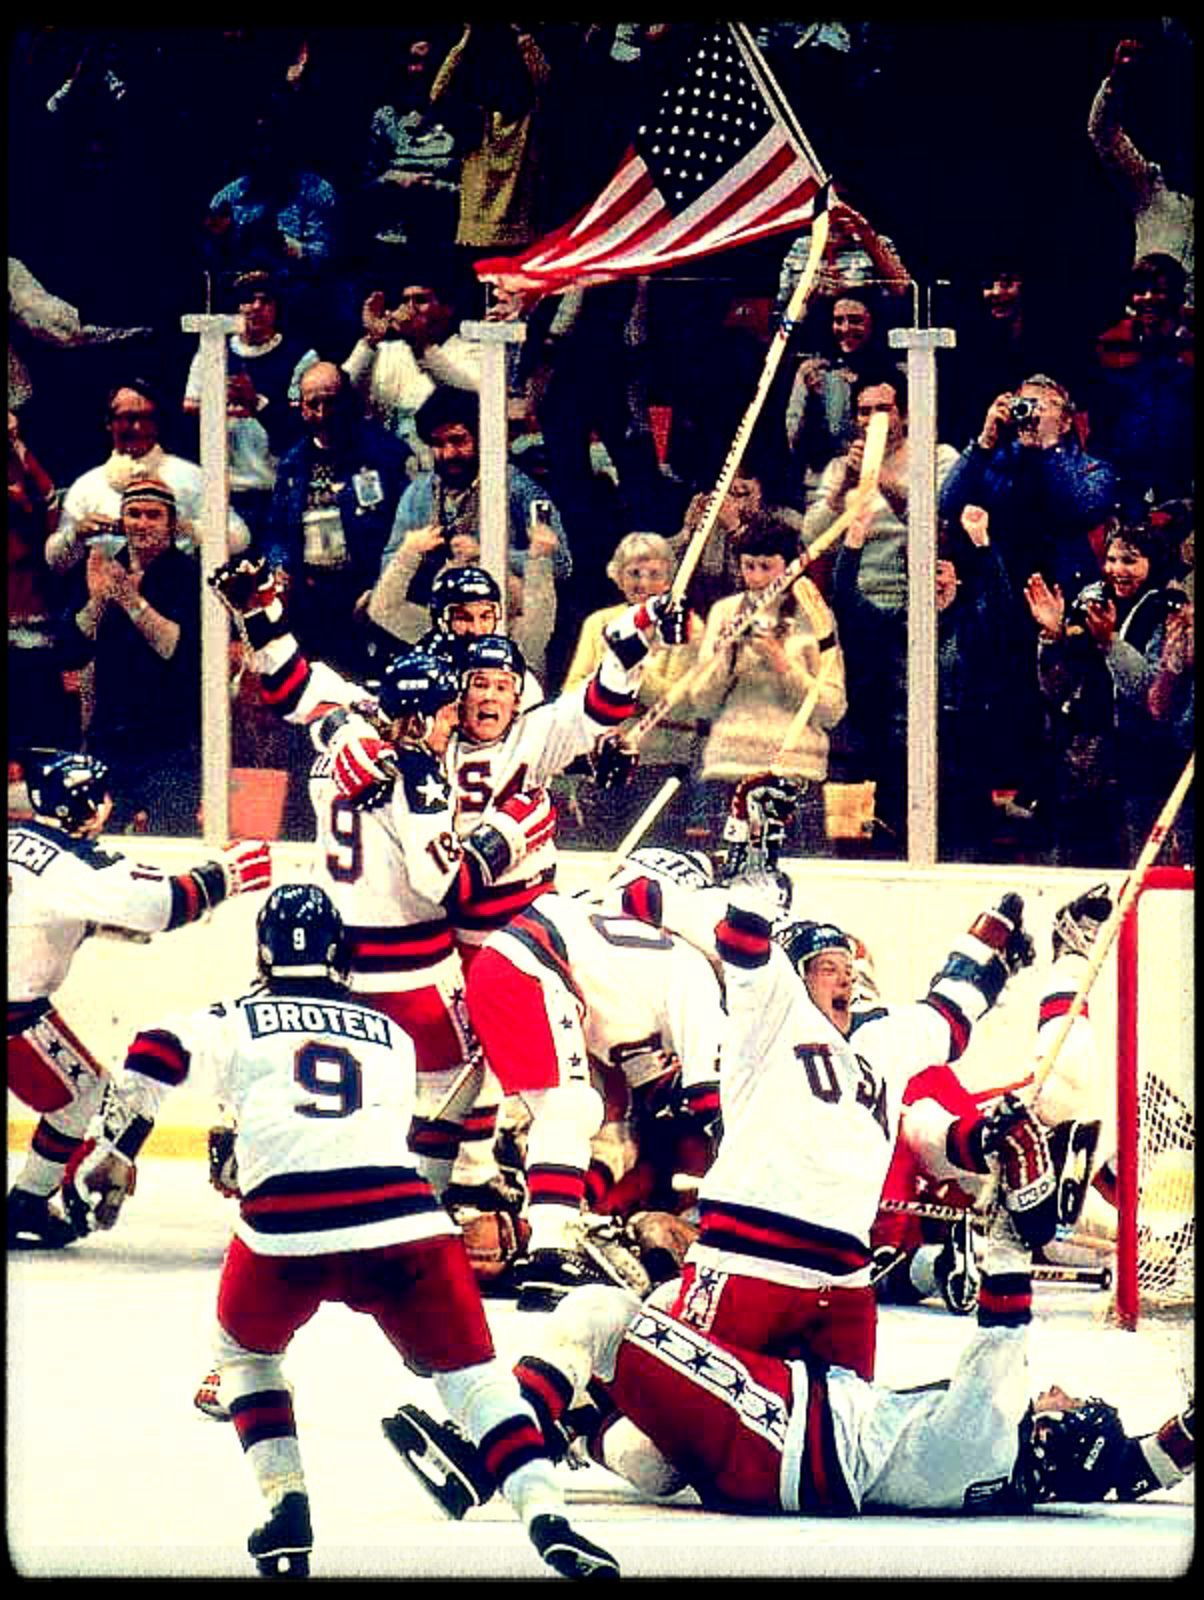 Ice Hockey At The 1980 Winter Olympics Was Held At The Olympic Arena And The Olympic Fieldhouse Now Known Olympic Hockey Usa Hockey Sports Illustrated Covers